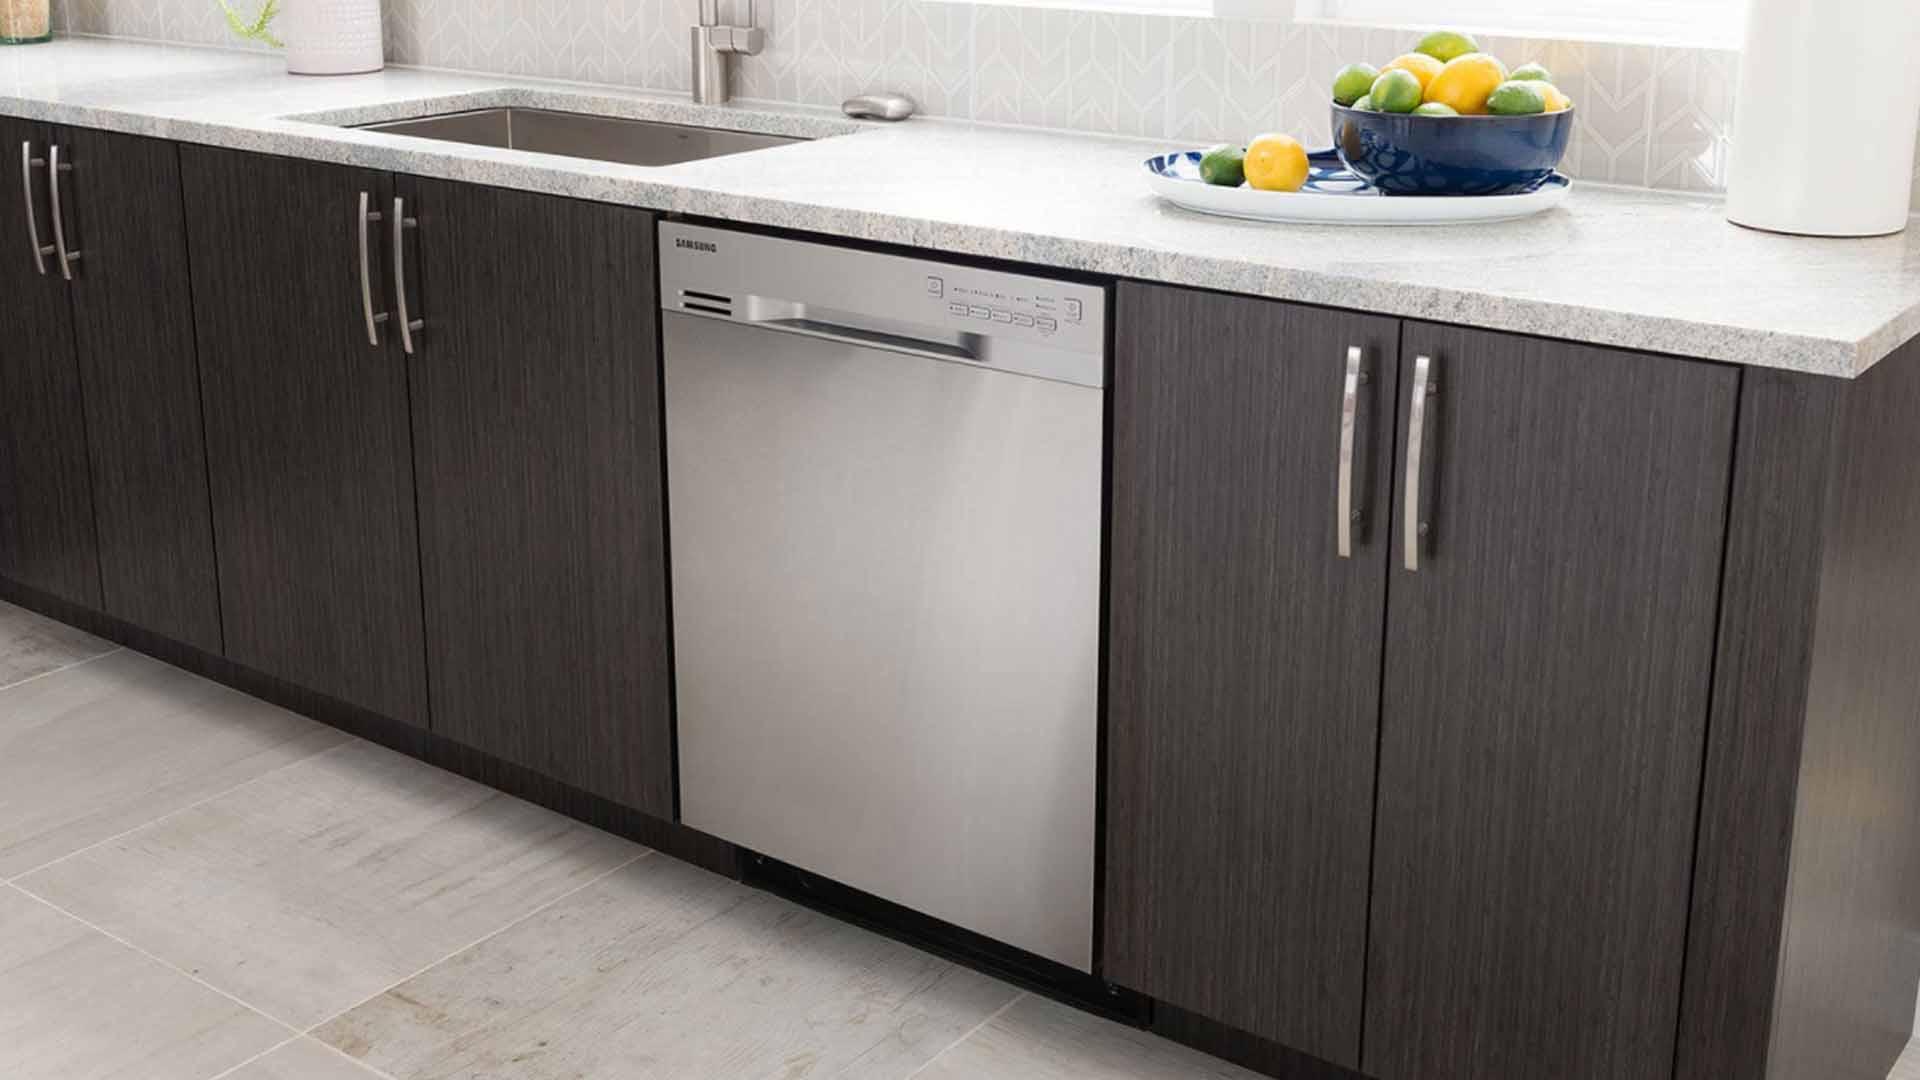 Samsung Dishwasher Appliances Repair Service   Samsung Appliance Repair